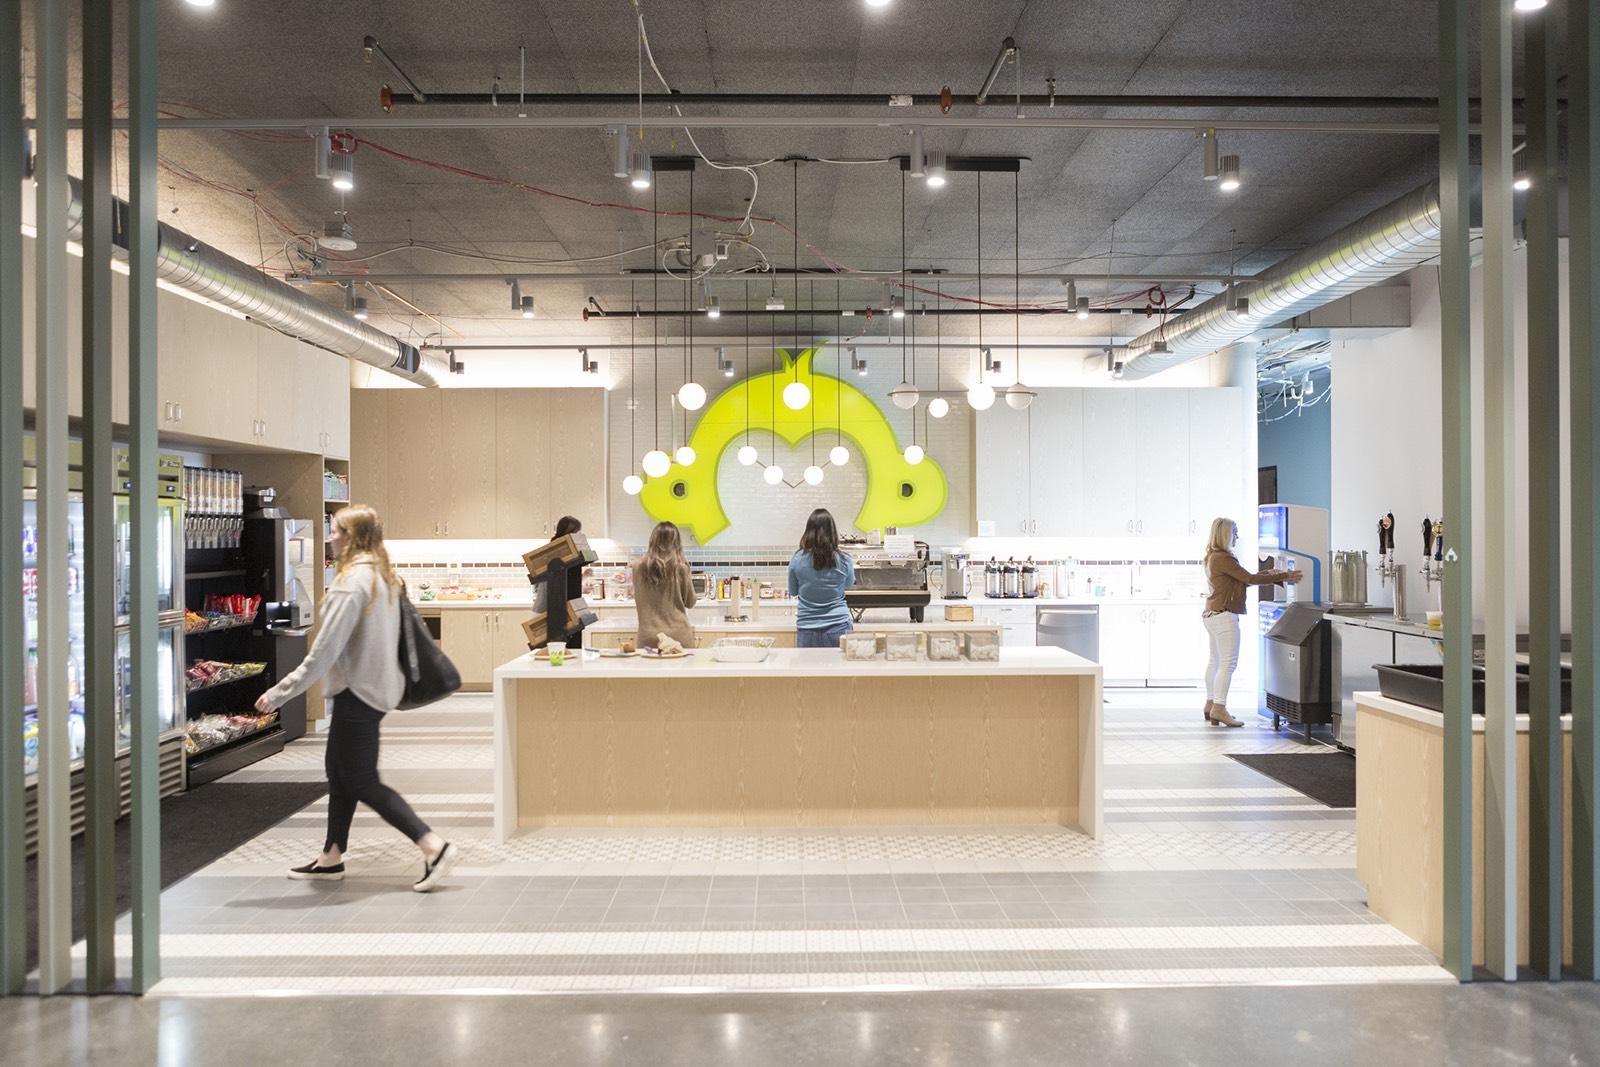 A Tour Of Surveymonkey S Brand New San Mateo Headquarters